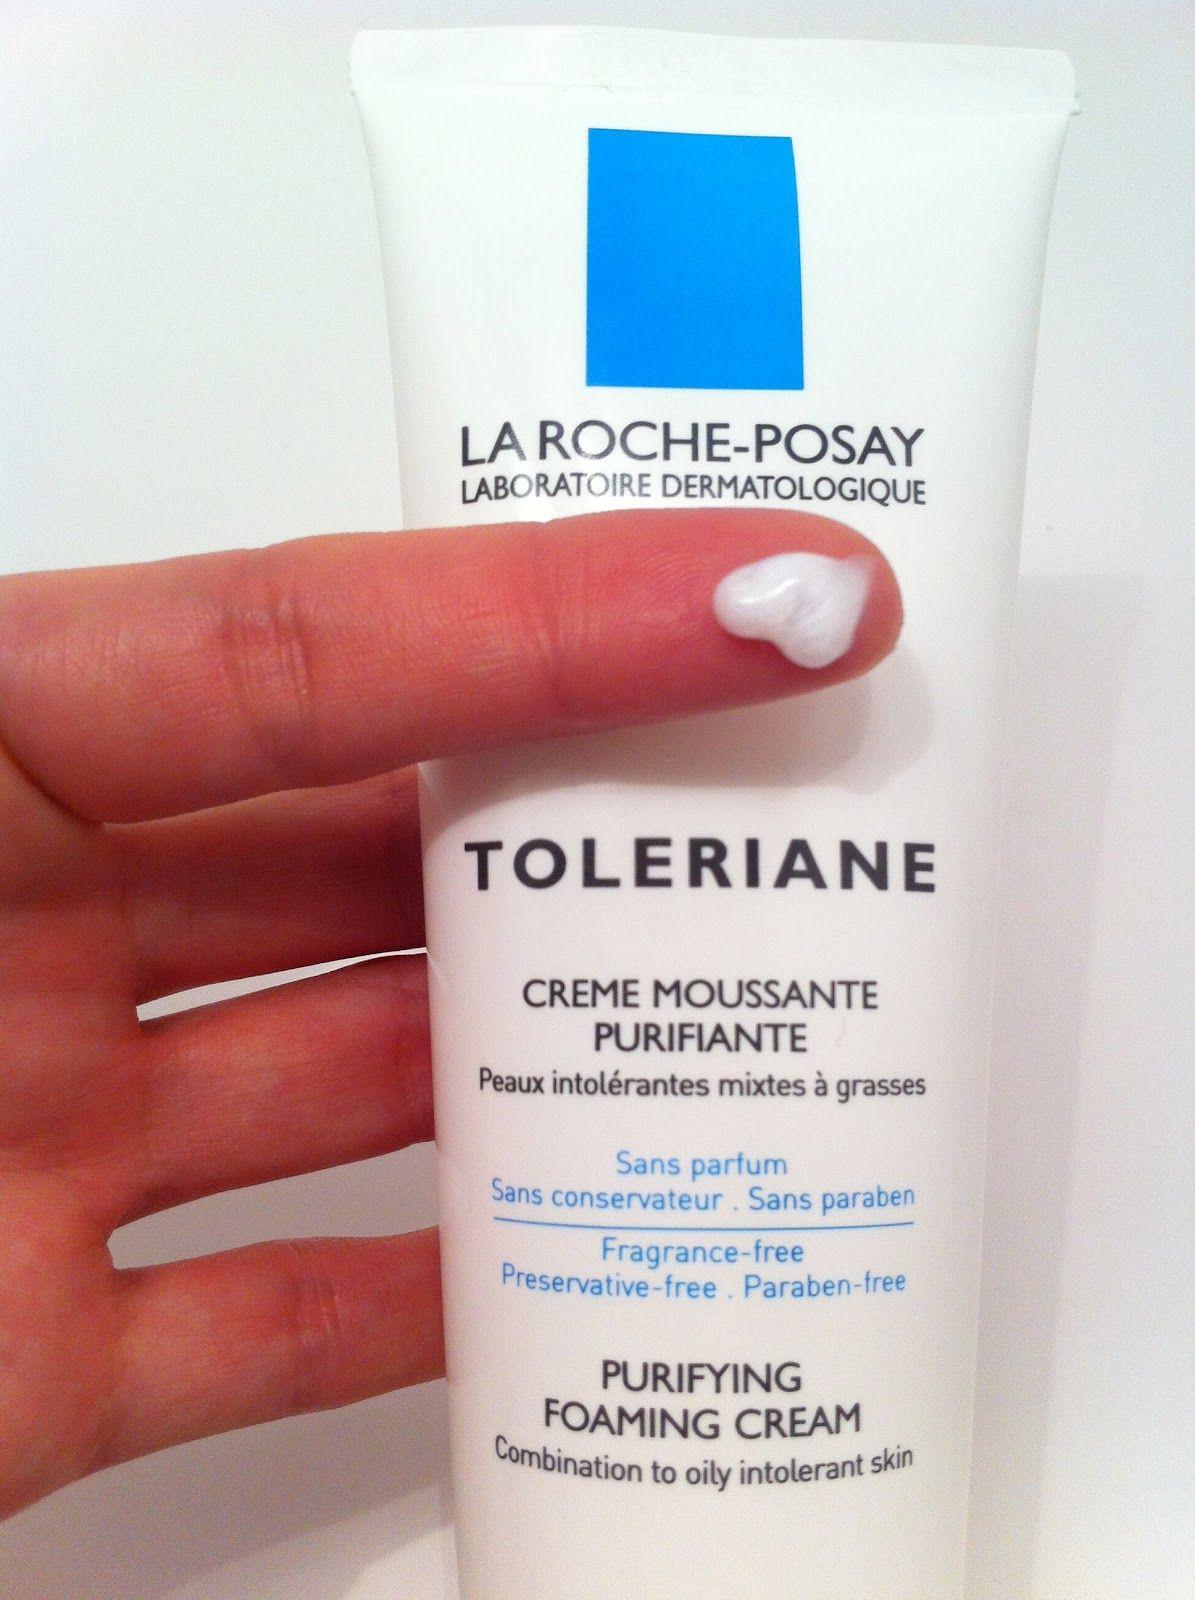 Review La Roche Posay Purifying Foaming Cream Cream Cleanser Best Acne Cleanser La Roche Posay